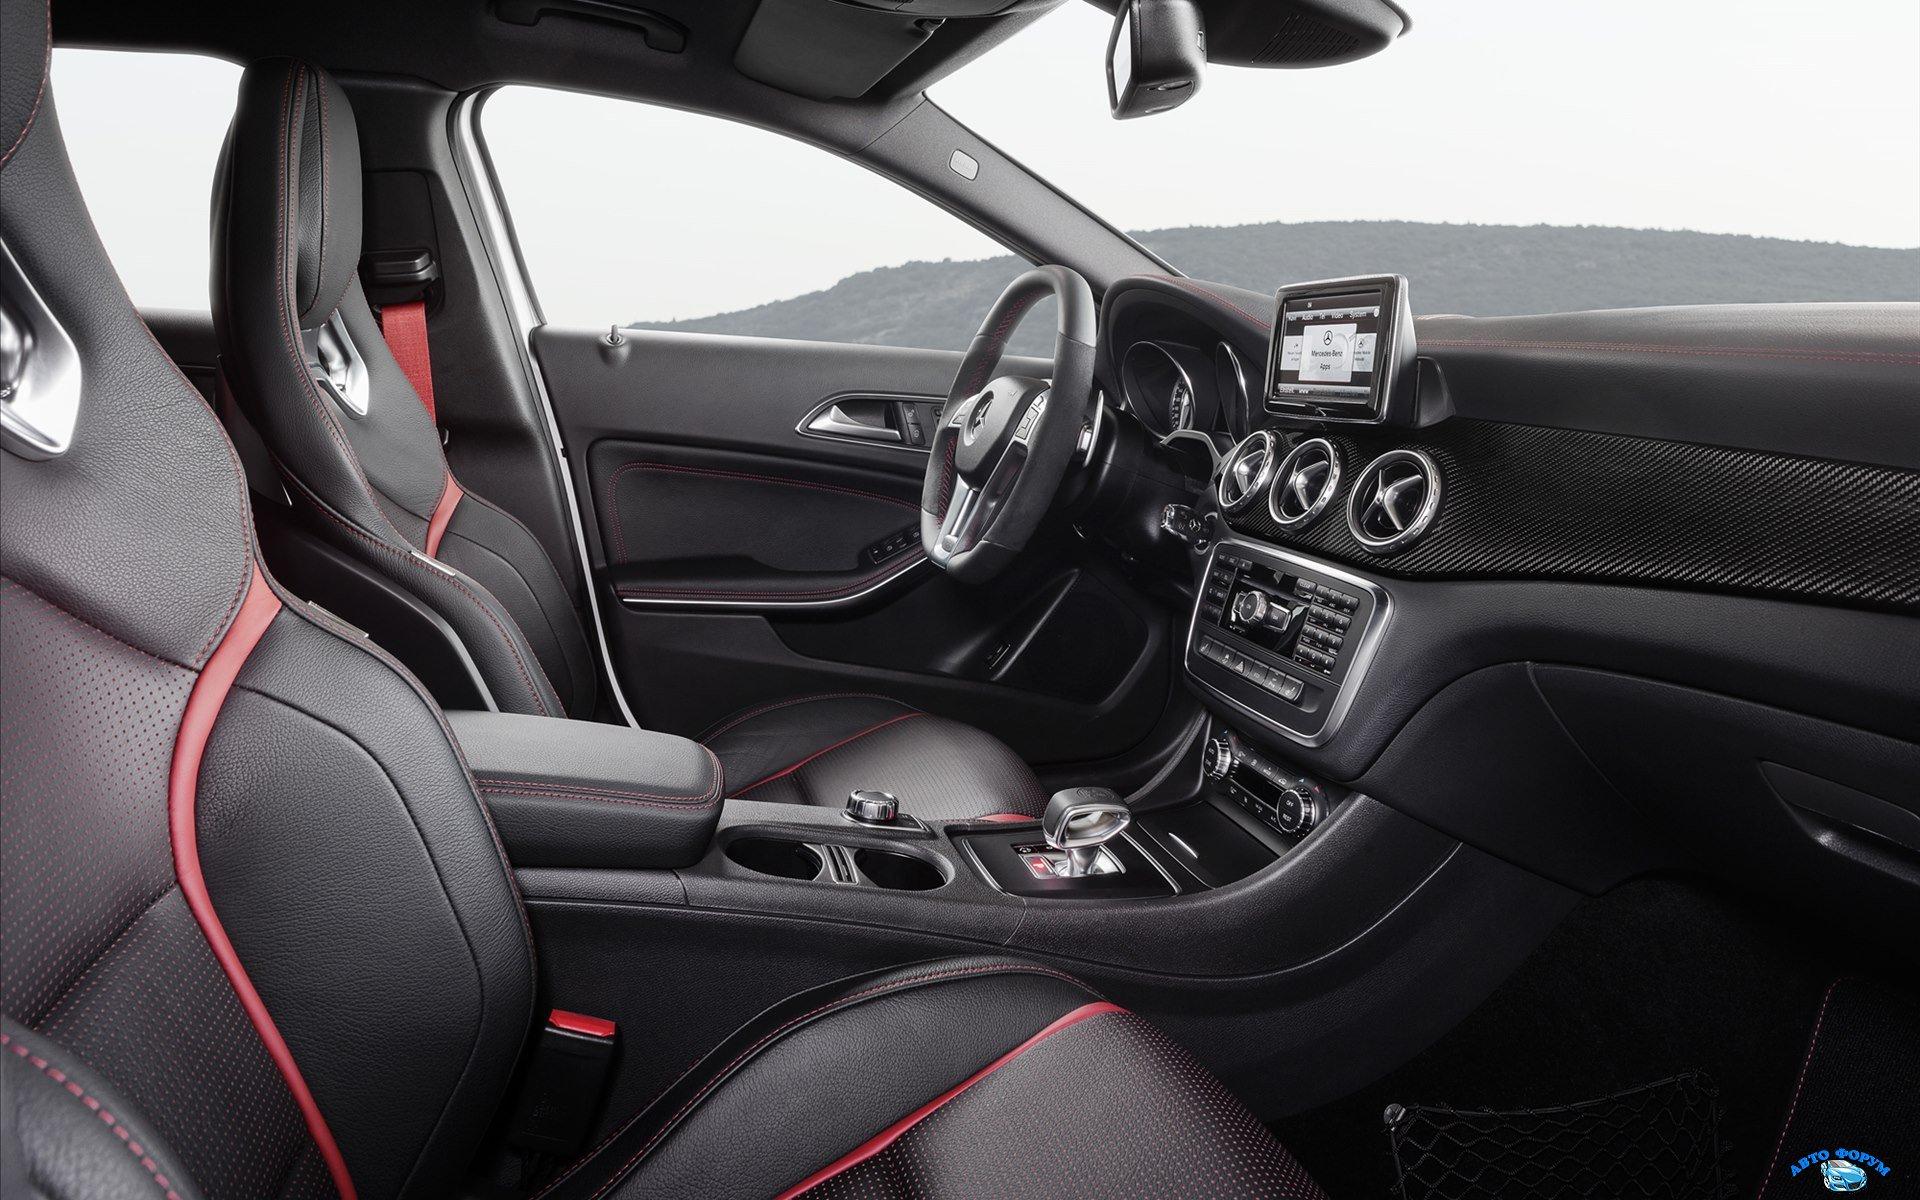 Mercedes-Benz-GLA-45-AMG-2014-widescreen-06.jpg